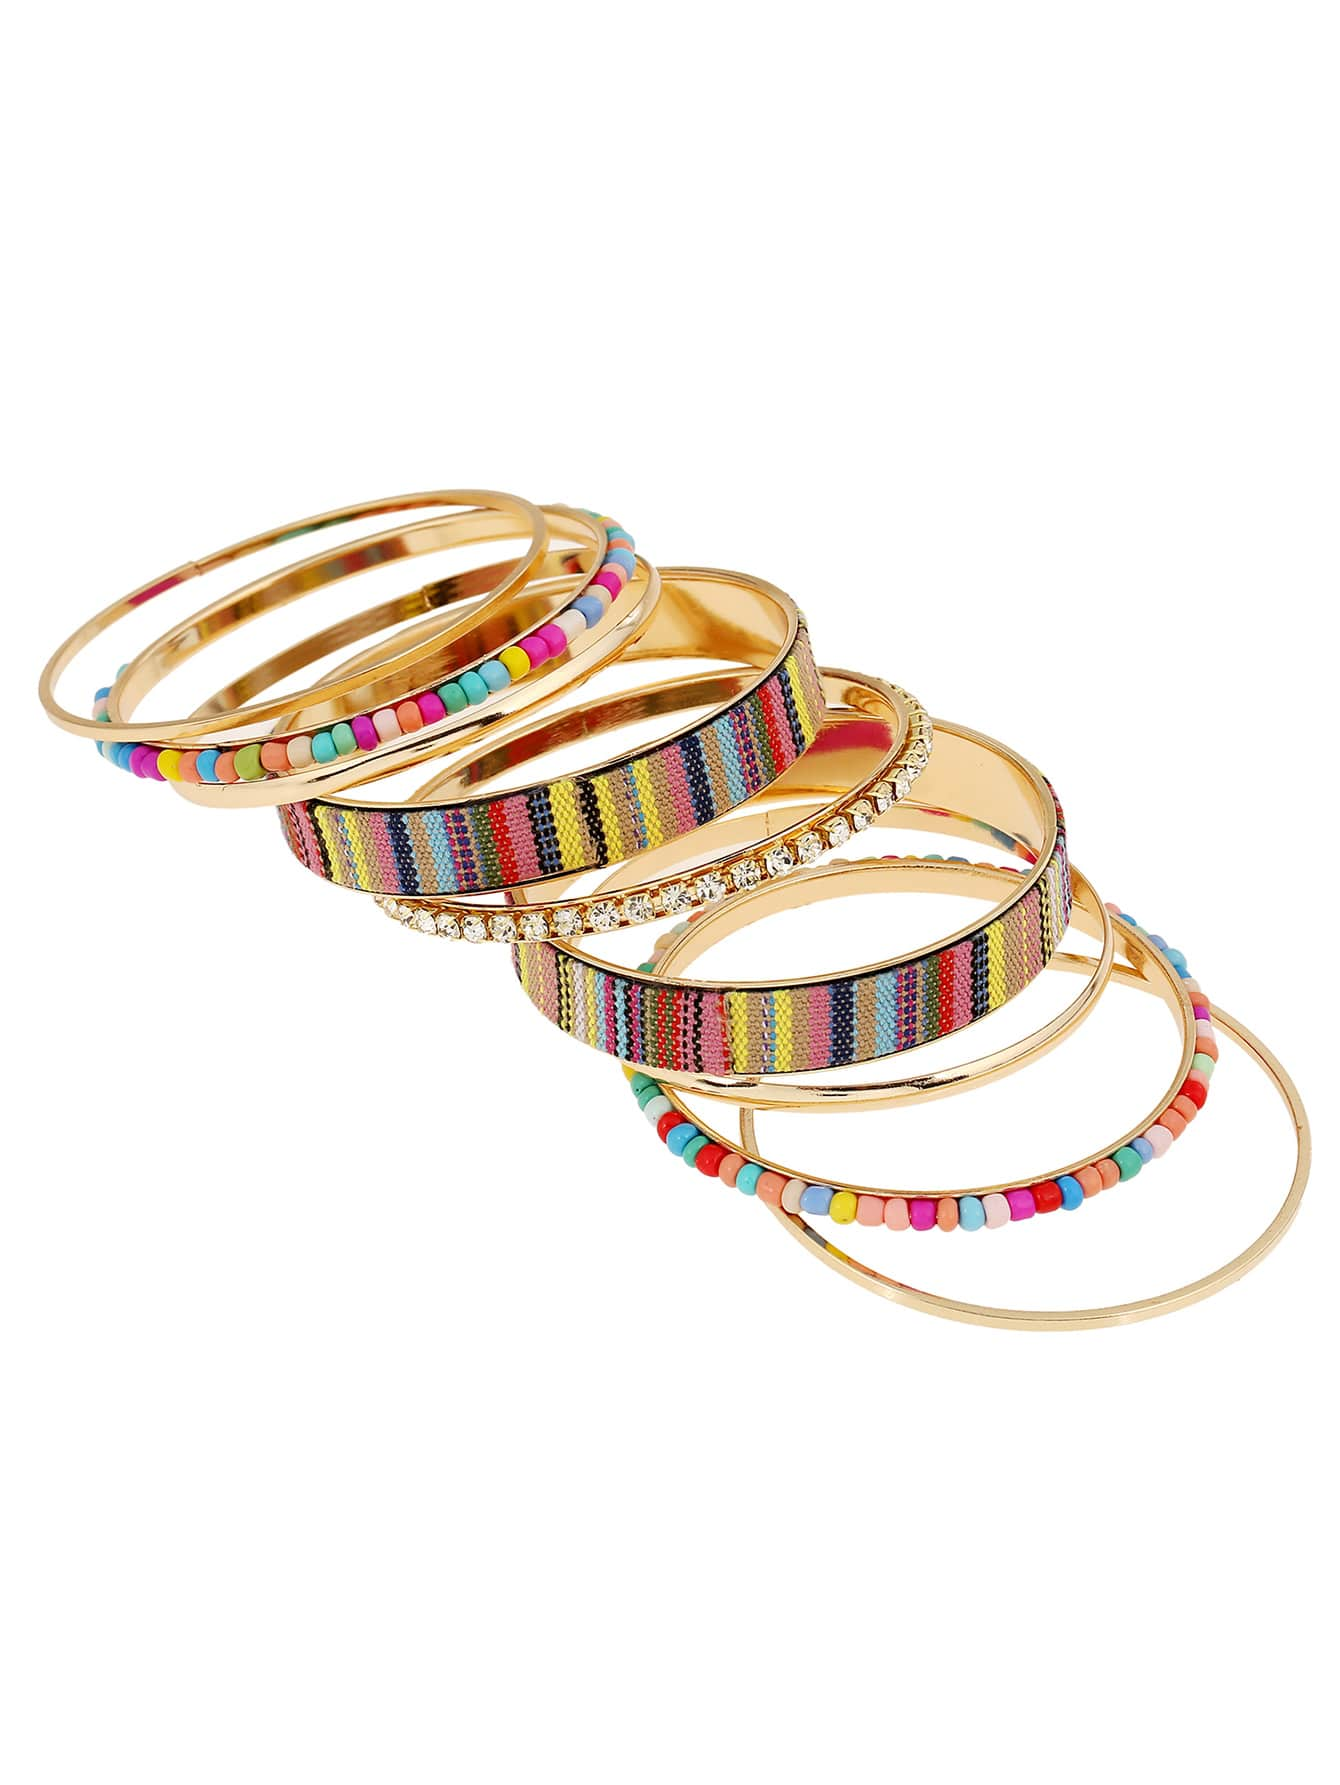 Beaded Trim Layered Bracelet 9pcs кабель микрофонный onetech pro two xlr jack 6 3 1 m